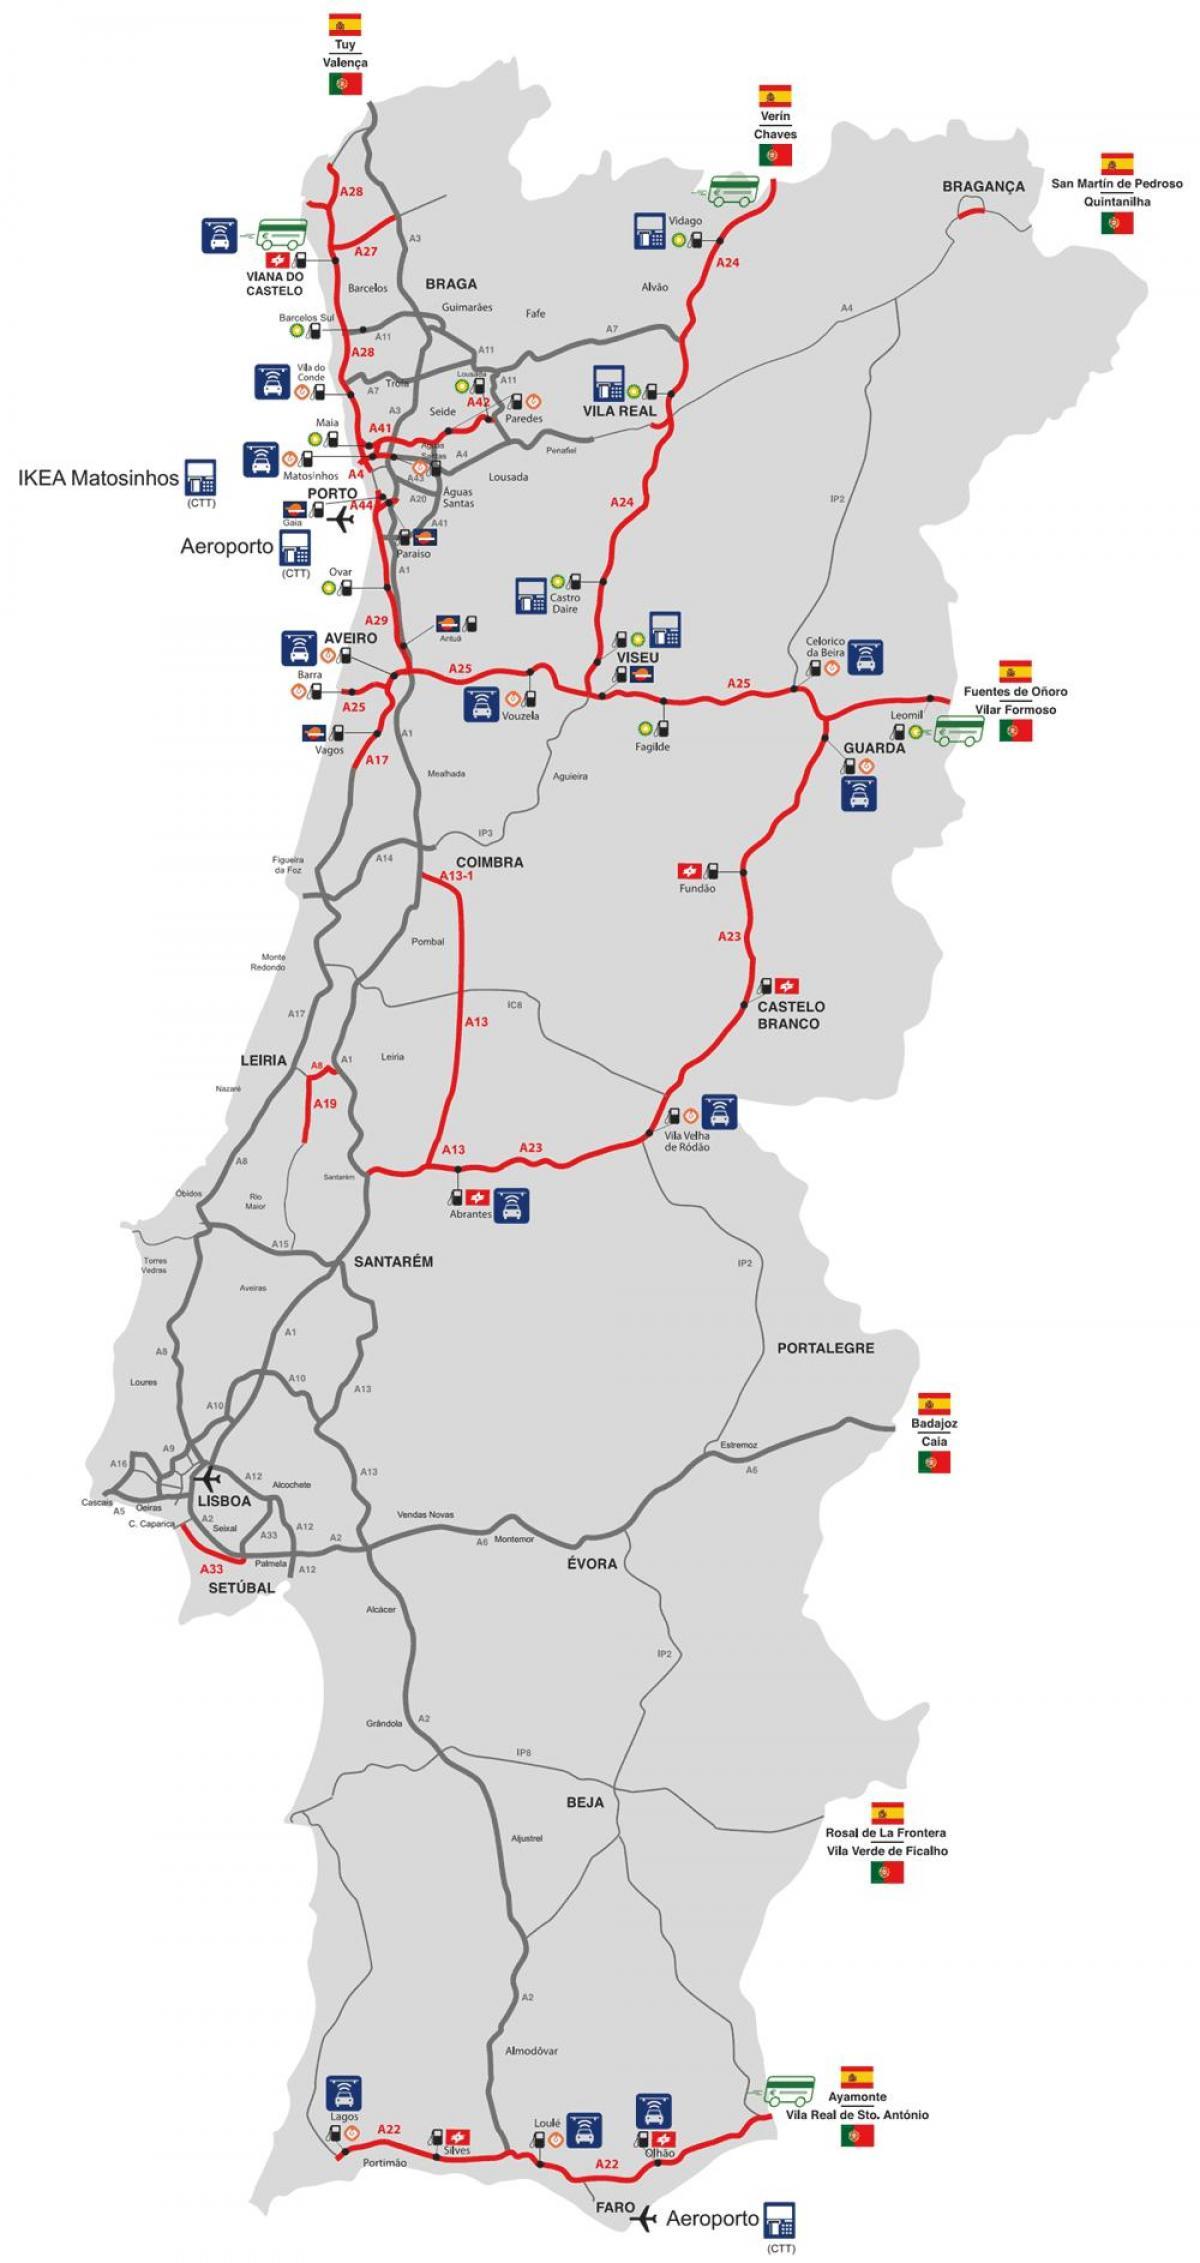 Portugal Cesta S Naplatom Cestarine Karta Cesta S Naplatom